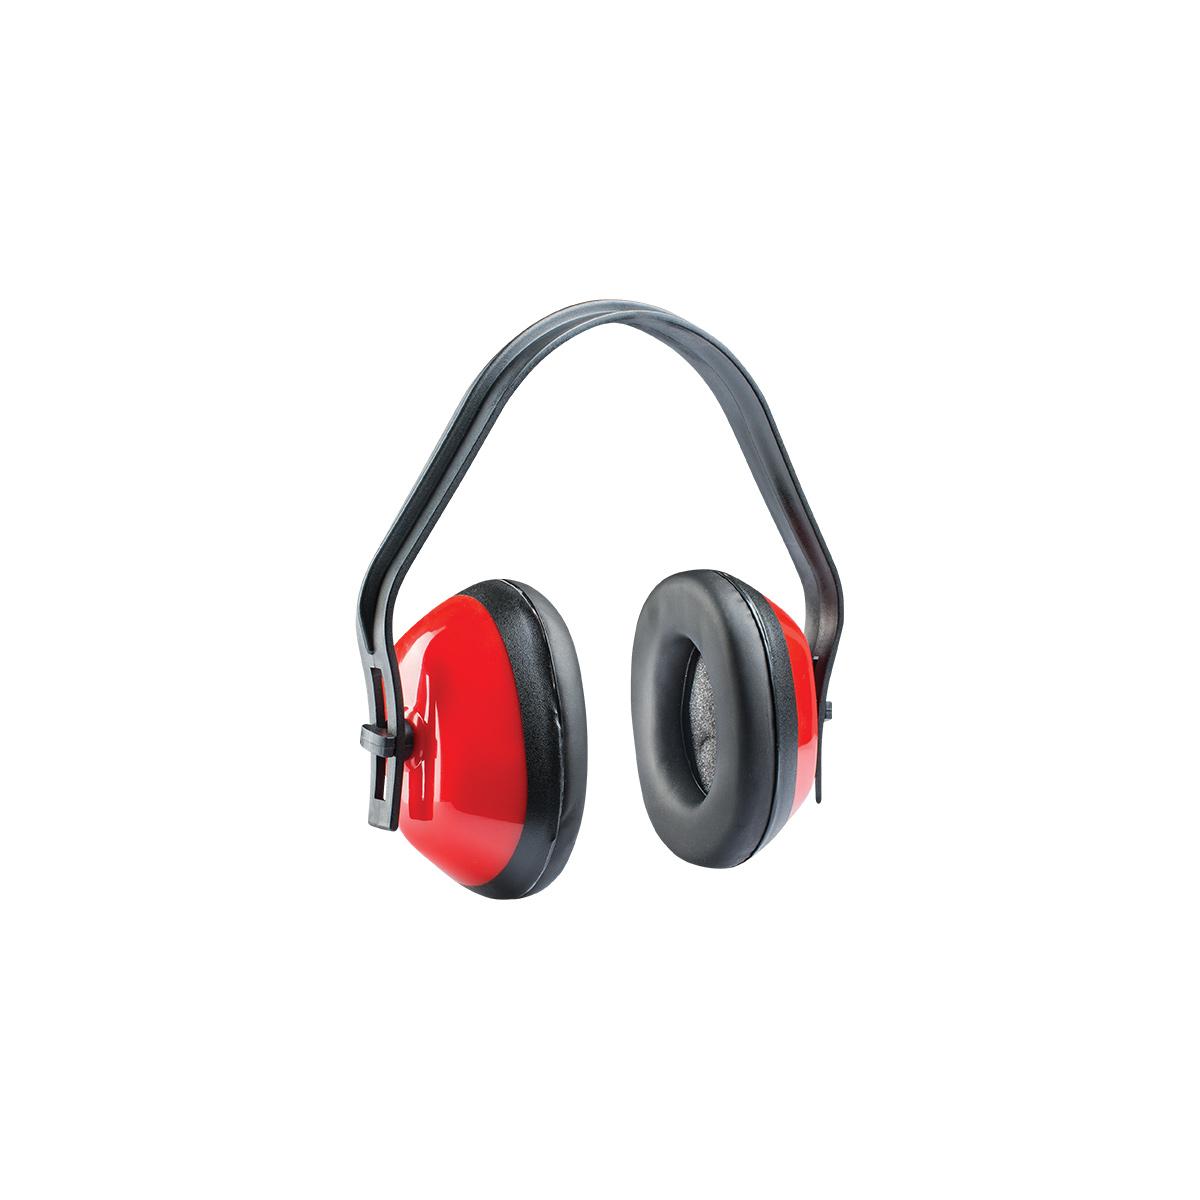 S.200 SAFETY EAR MUFFS